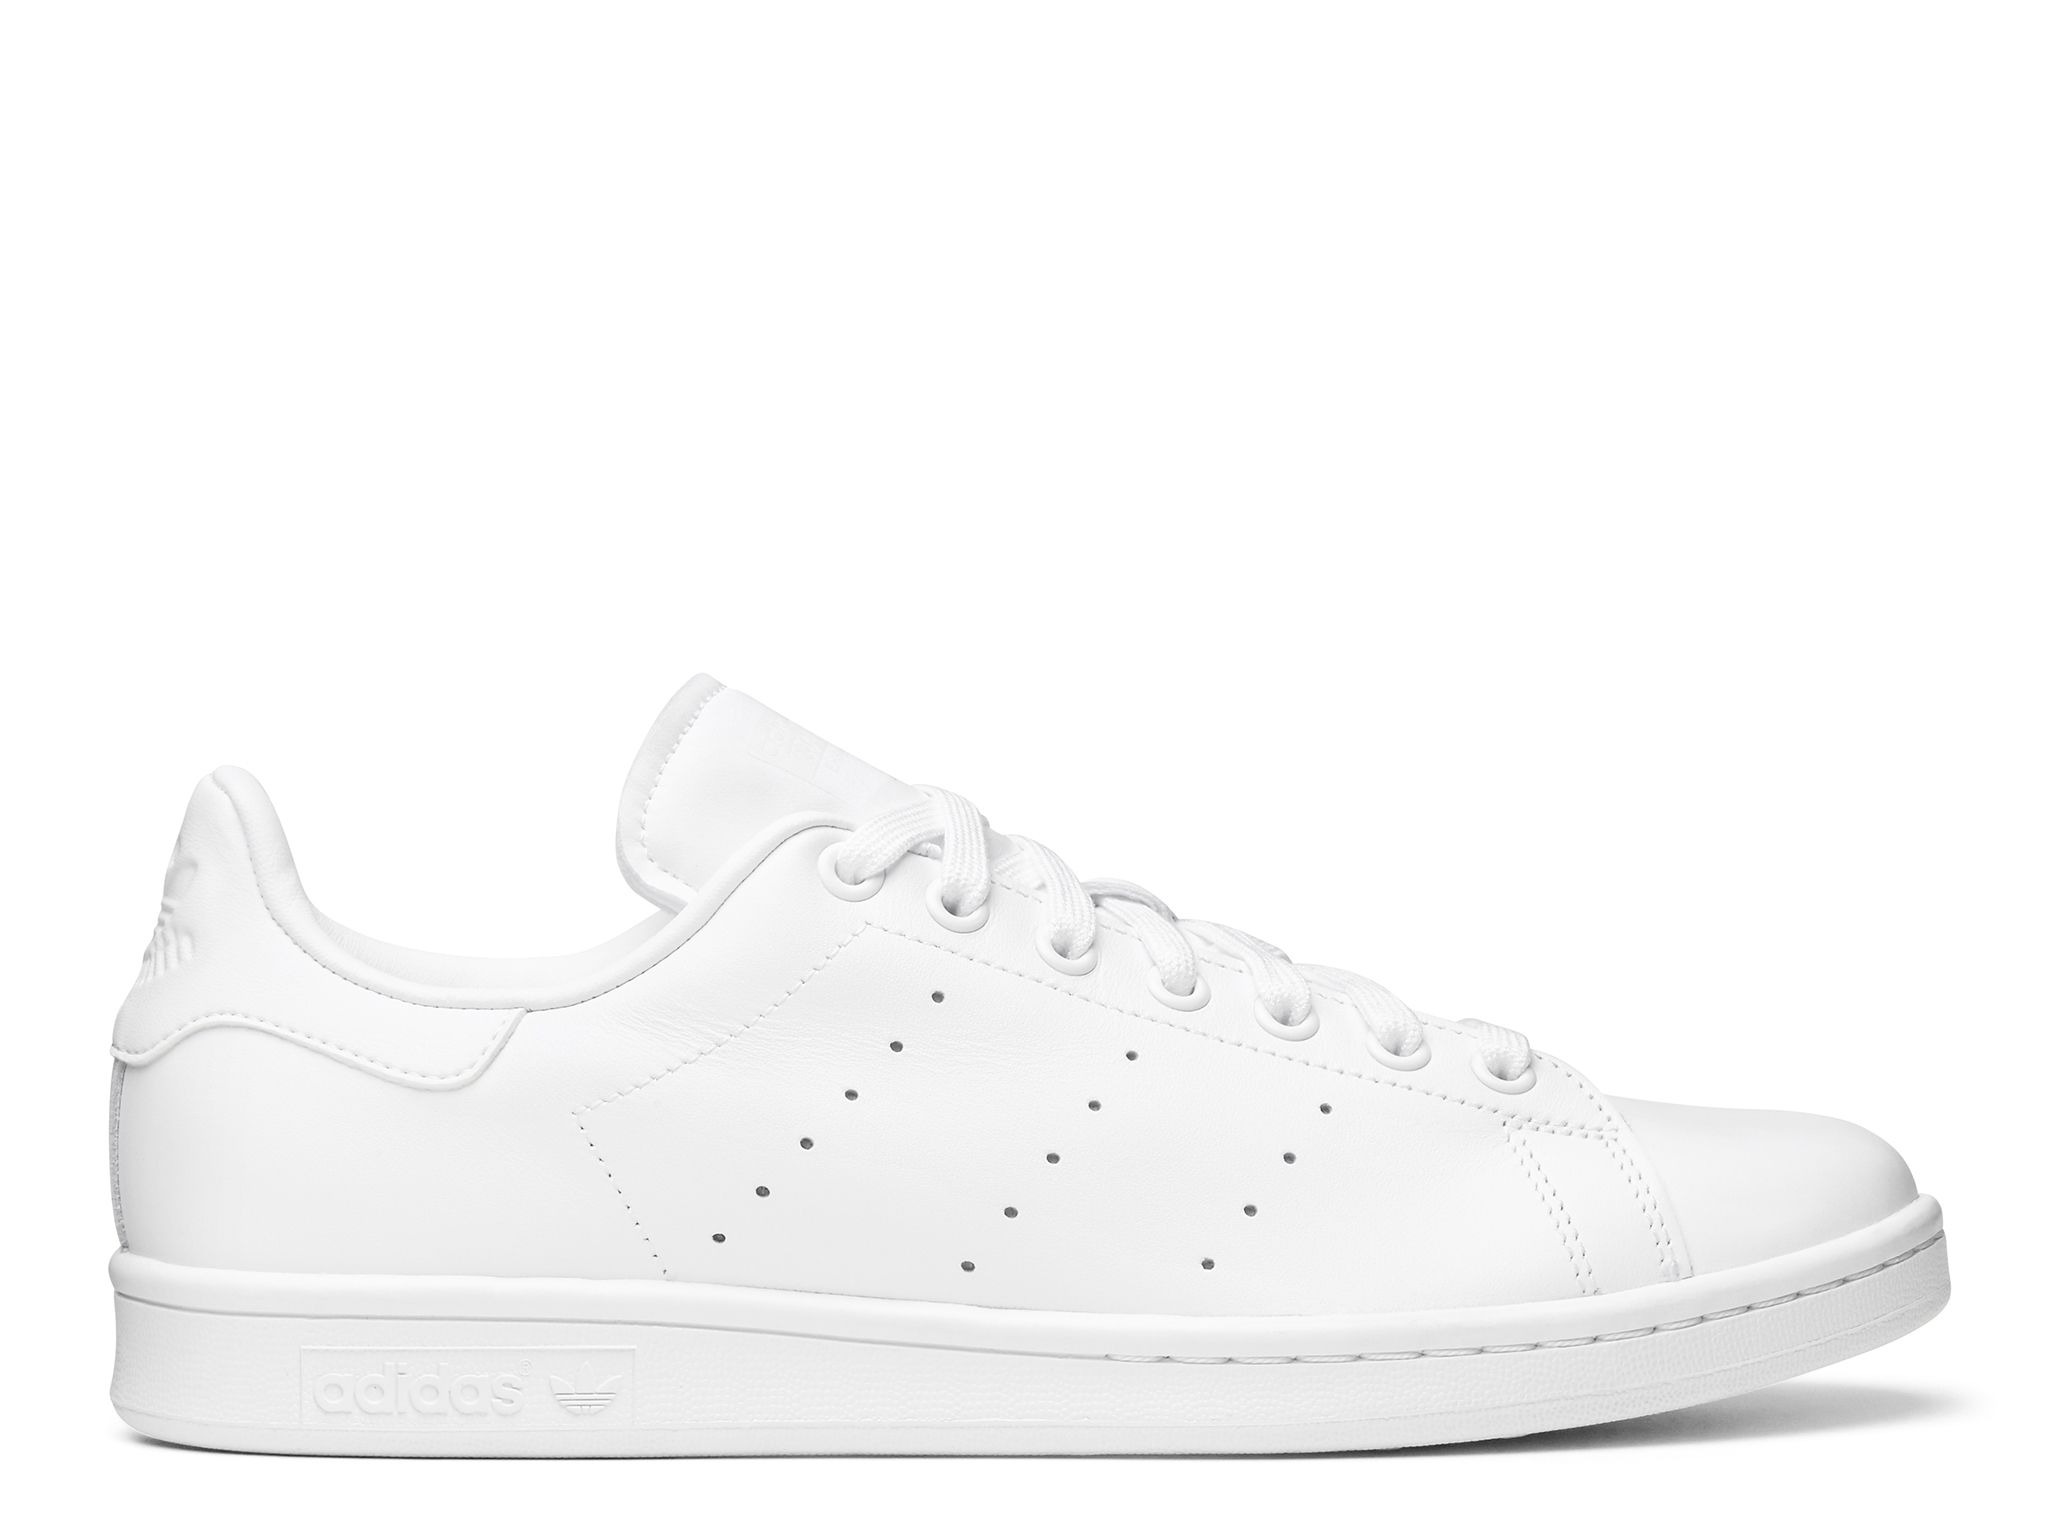 on sale cdec7 a5c7a ADIDAS STAN SMITH PREMIUM - Sneakerboy | sneakers. | Adidas ...